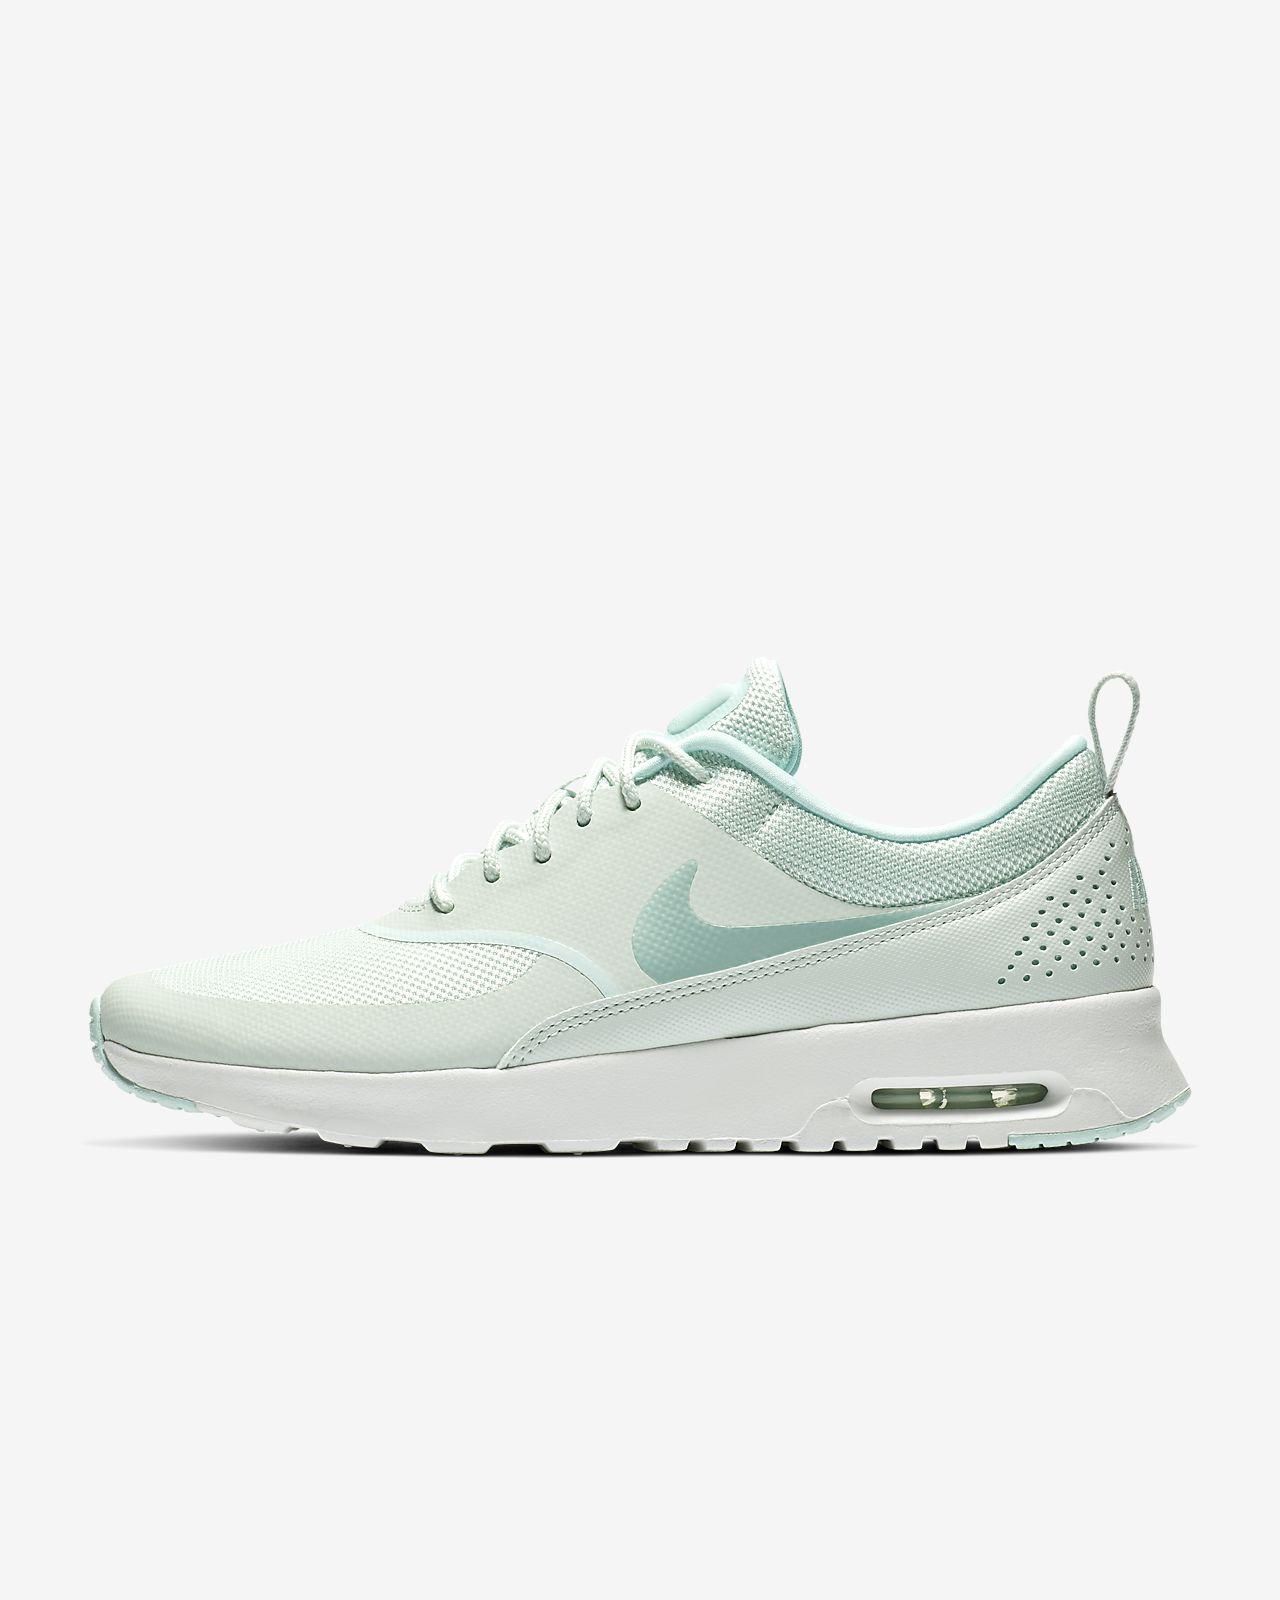 reputable site 2266a f2010 ... Sko Nike Air Max Thea för kvinnor